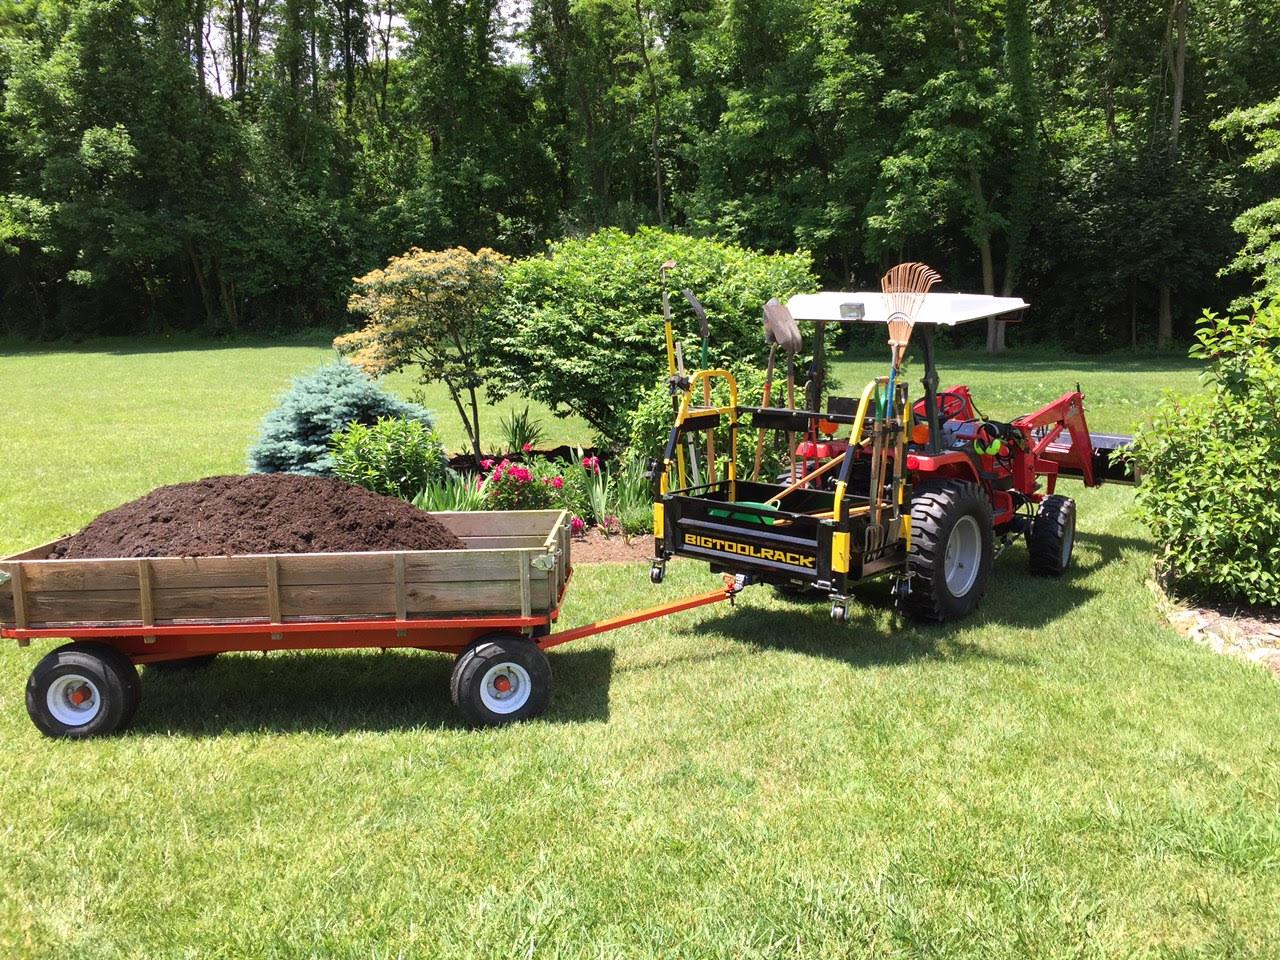 Bigtoolrack Landscaping, garden tool equipment transportation, lawn and garden machines, professional garden hand tools, transport tools used for gardening, transport landscape tools